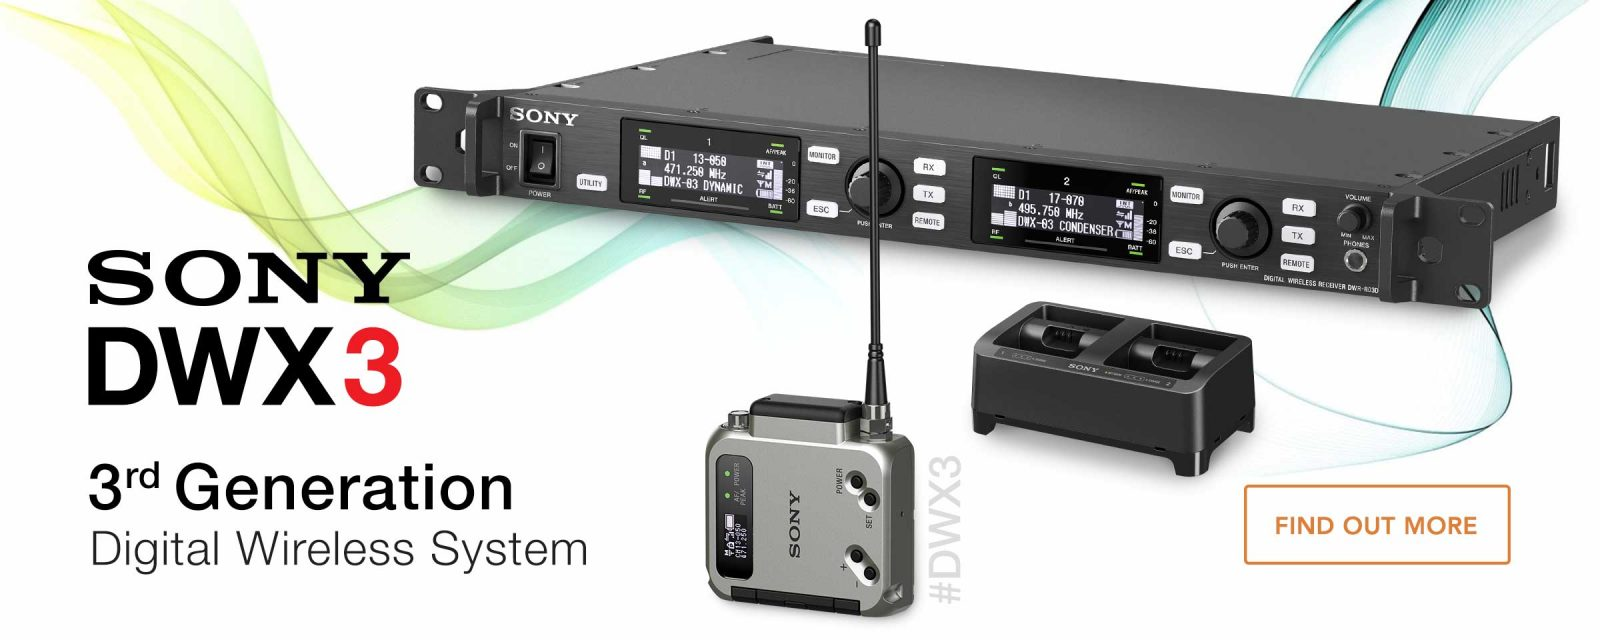 Introducing the new Sony DWX3 Digital Wireless